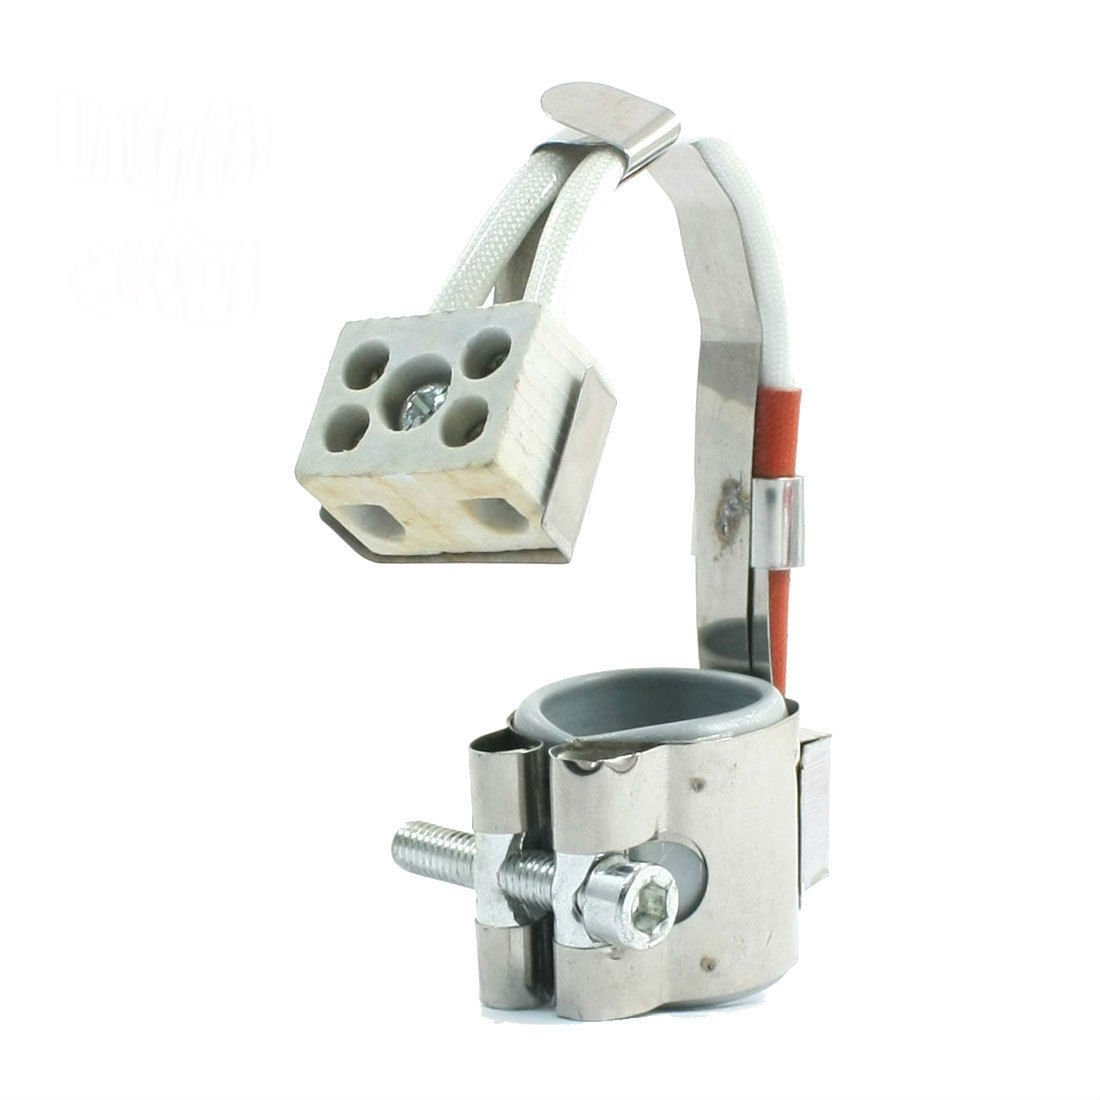 110V 300W 25mmx30mm Metal Screw Fixing Circular Flexible Mica Band Heater db